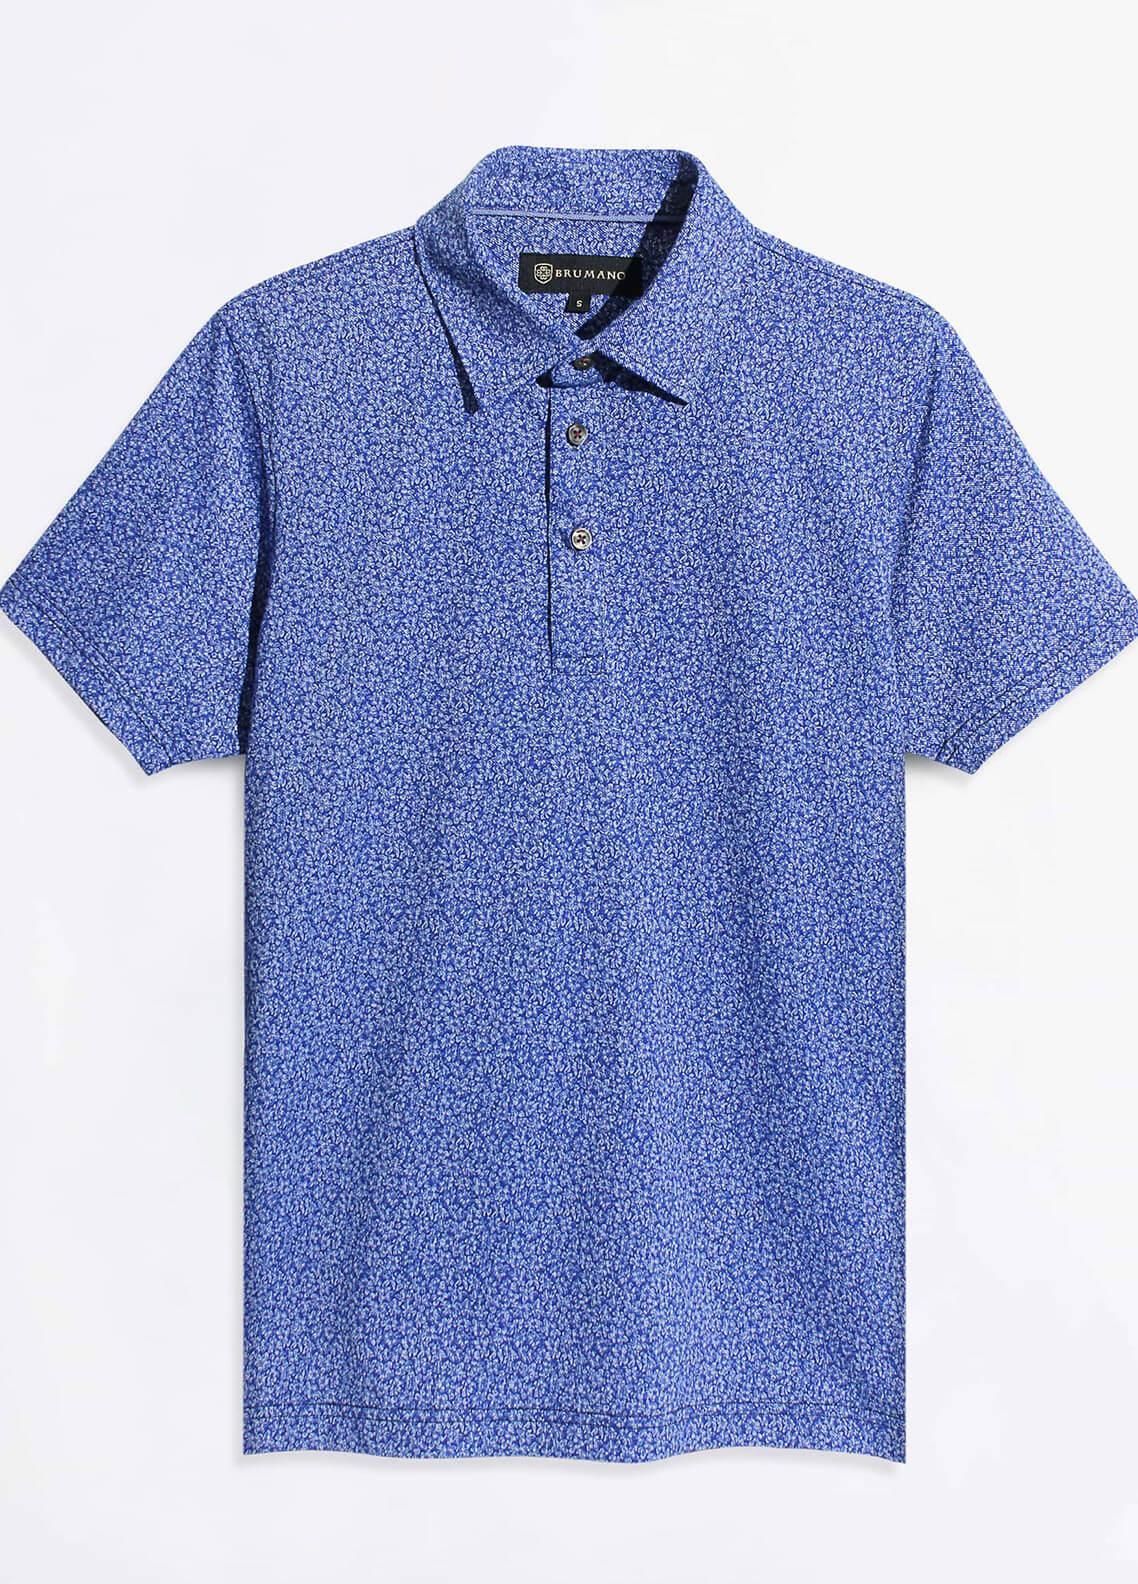 Brumano Cotton Polo Men Shirts - Blue BRM-977